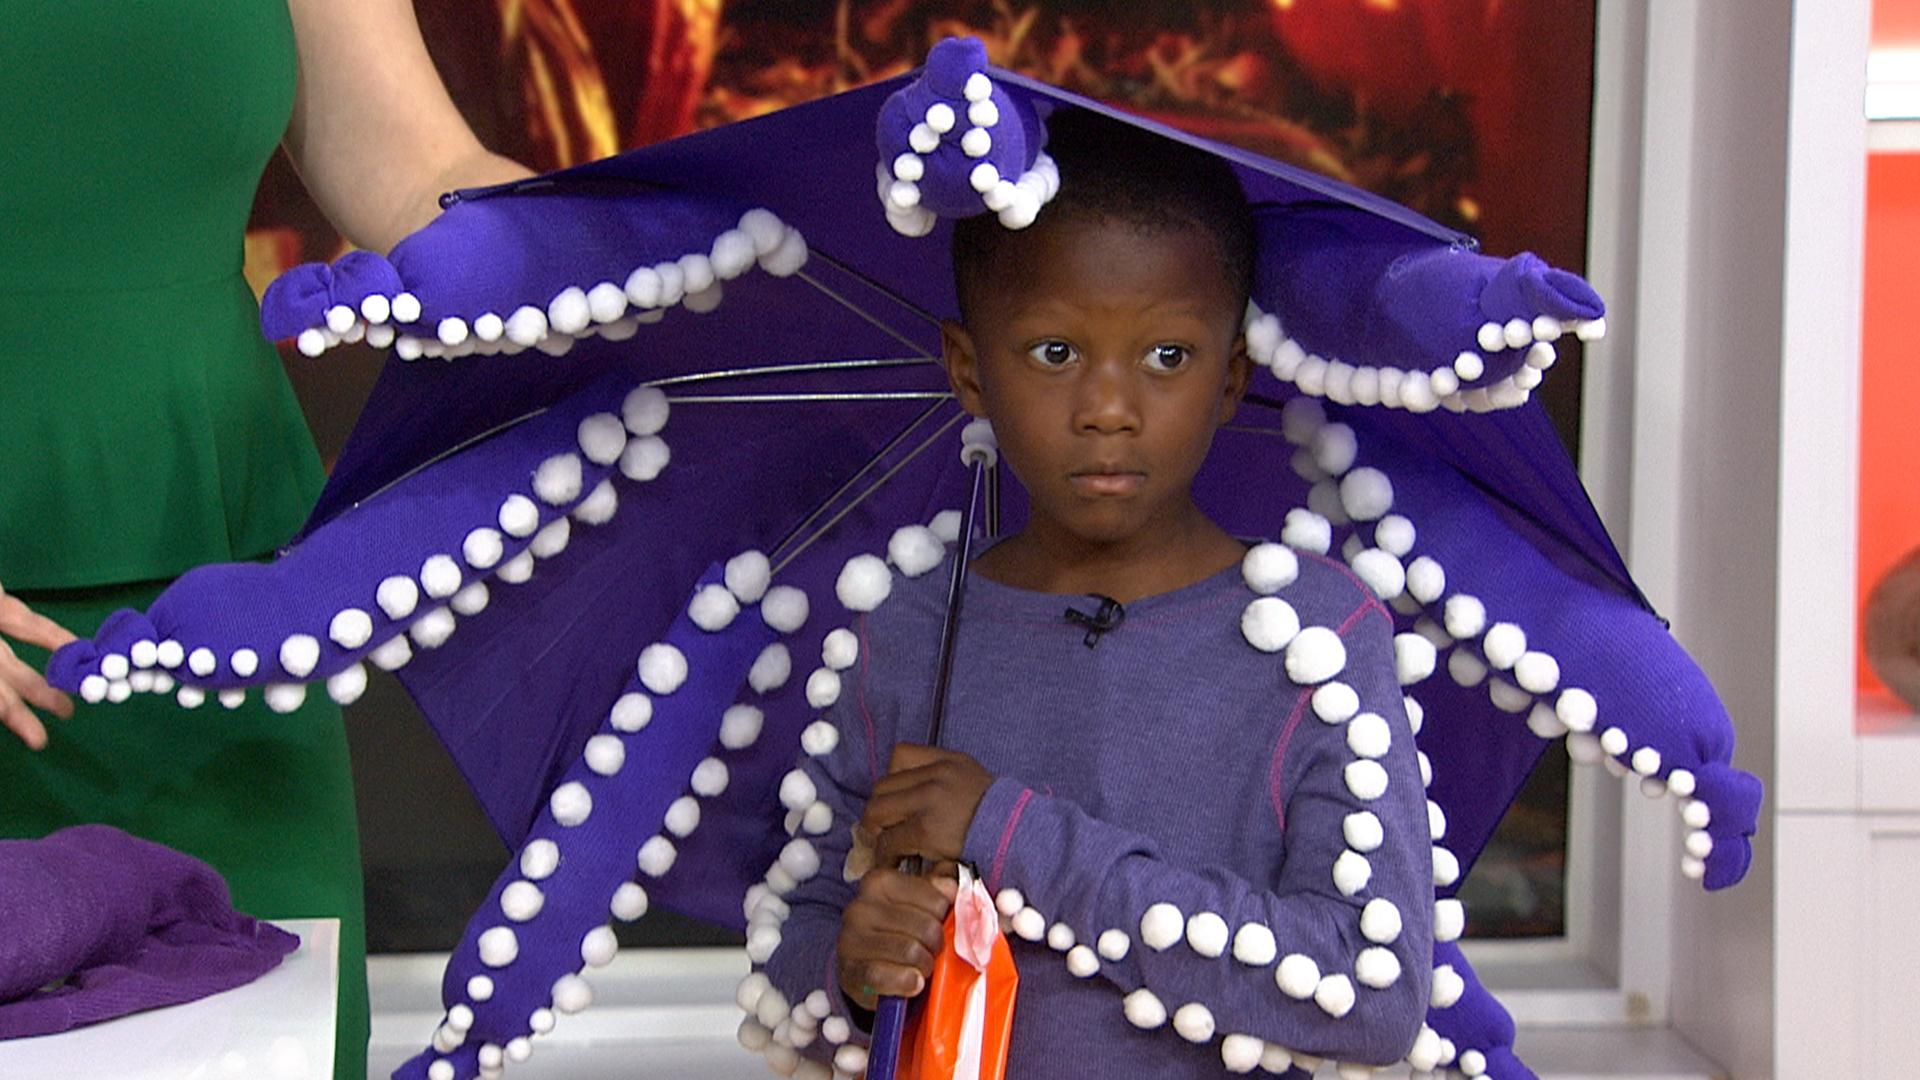 Diy halloween make an octopus costume out of an umbrella solutioingenieria Images